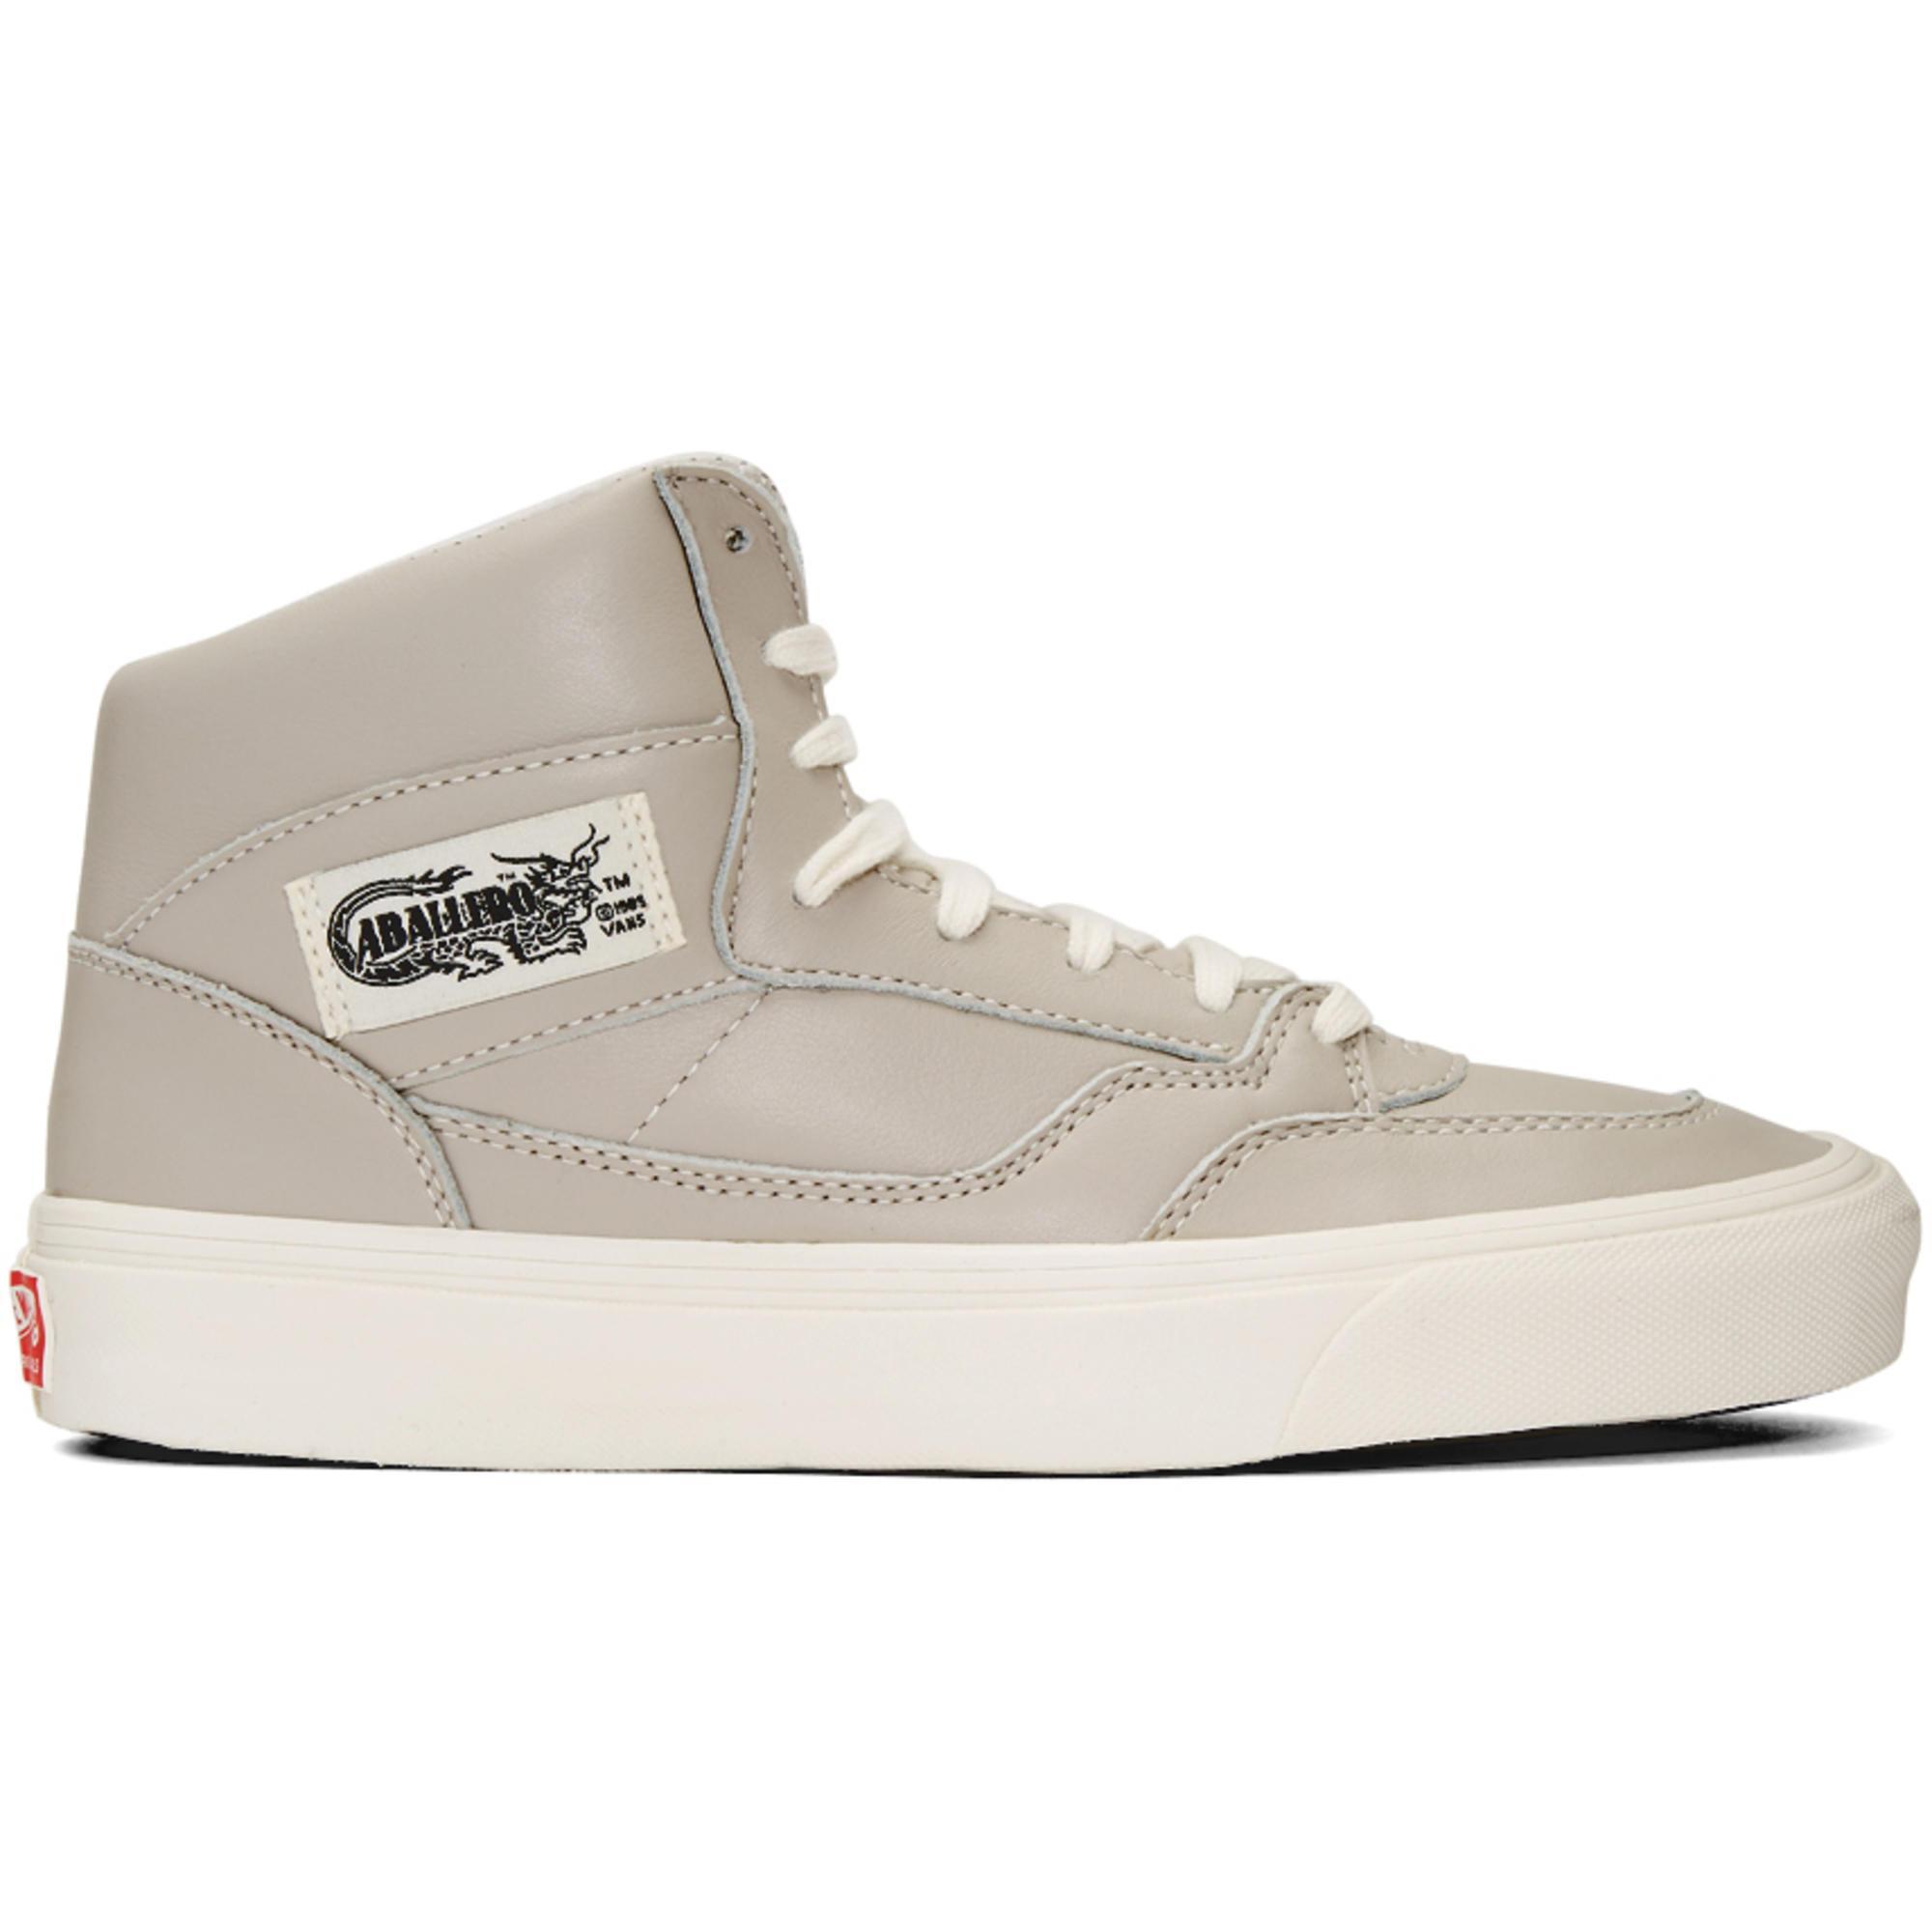 c2ca9763952dca Lyst - Vans Grey Steve Caballero Edition Og Full Cab Lx Sneakers in ...